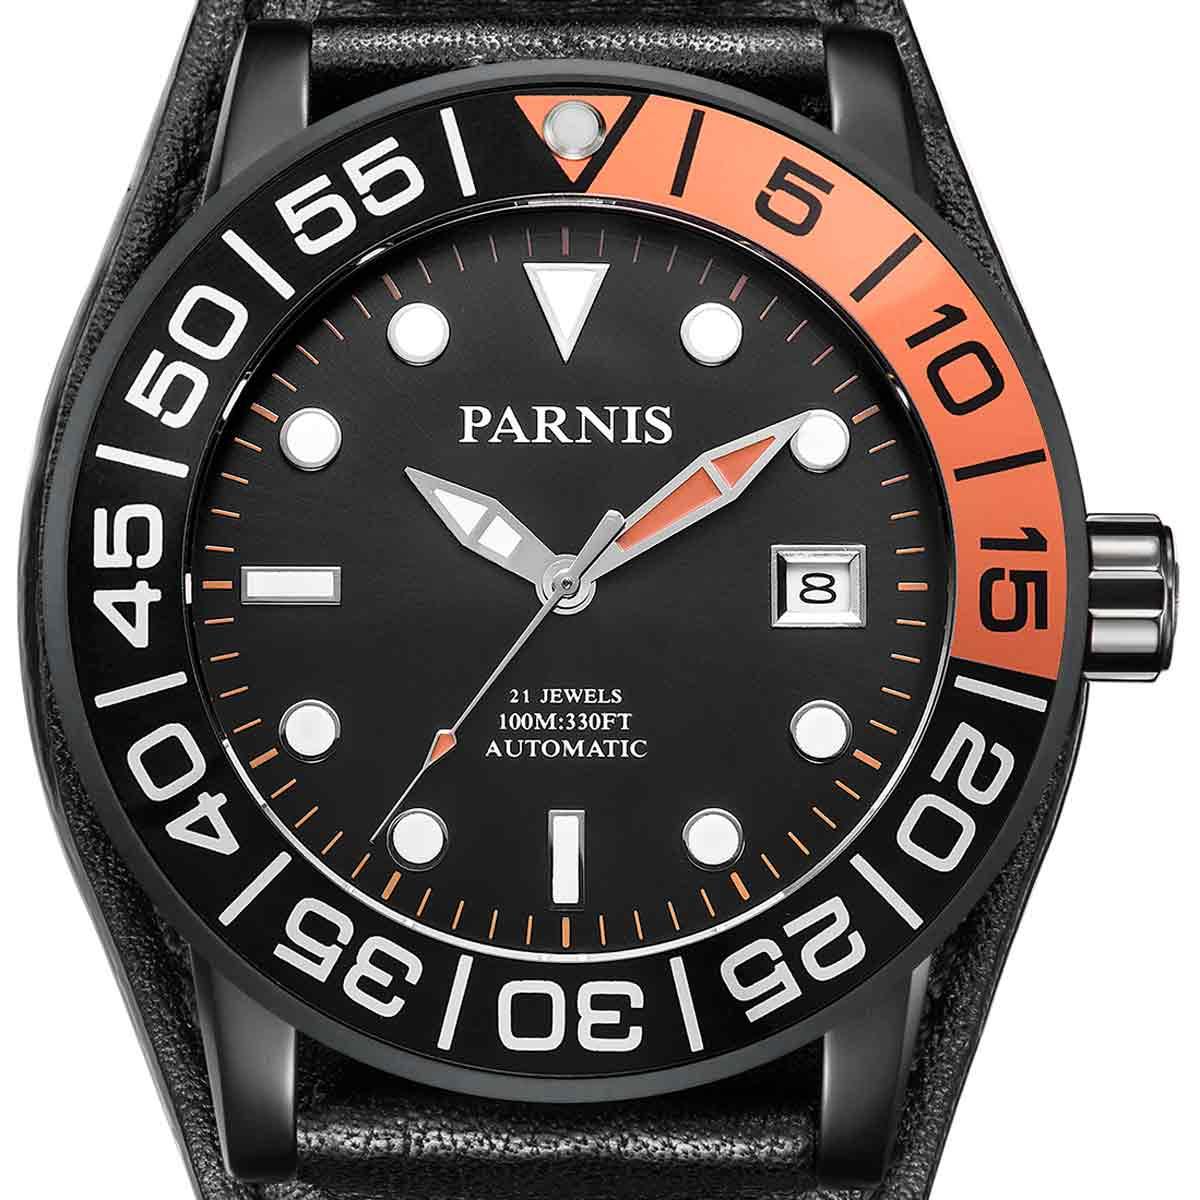 【NEW】PARNIS パーニス 自動巻き 腕時計 [PA6056-S3AL-BKorBK] 並行輸入品 純正ケース メーカー保証12ヶ月